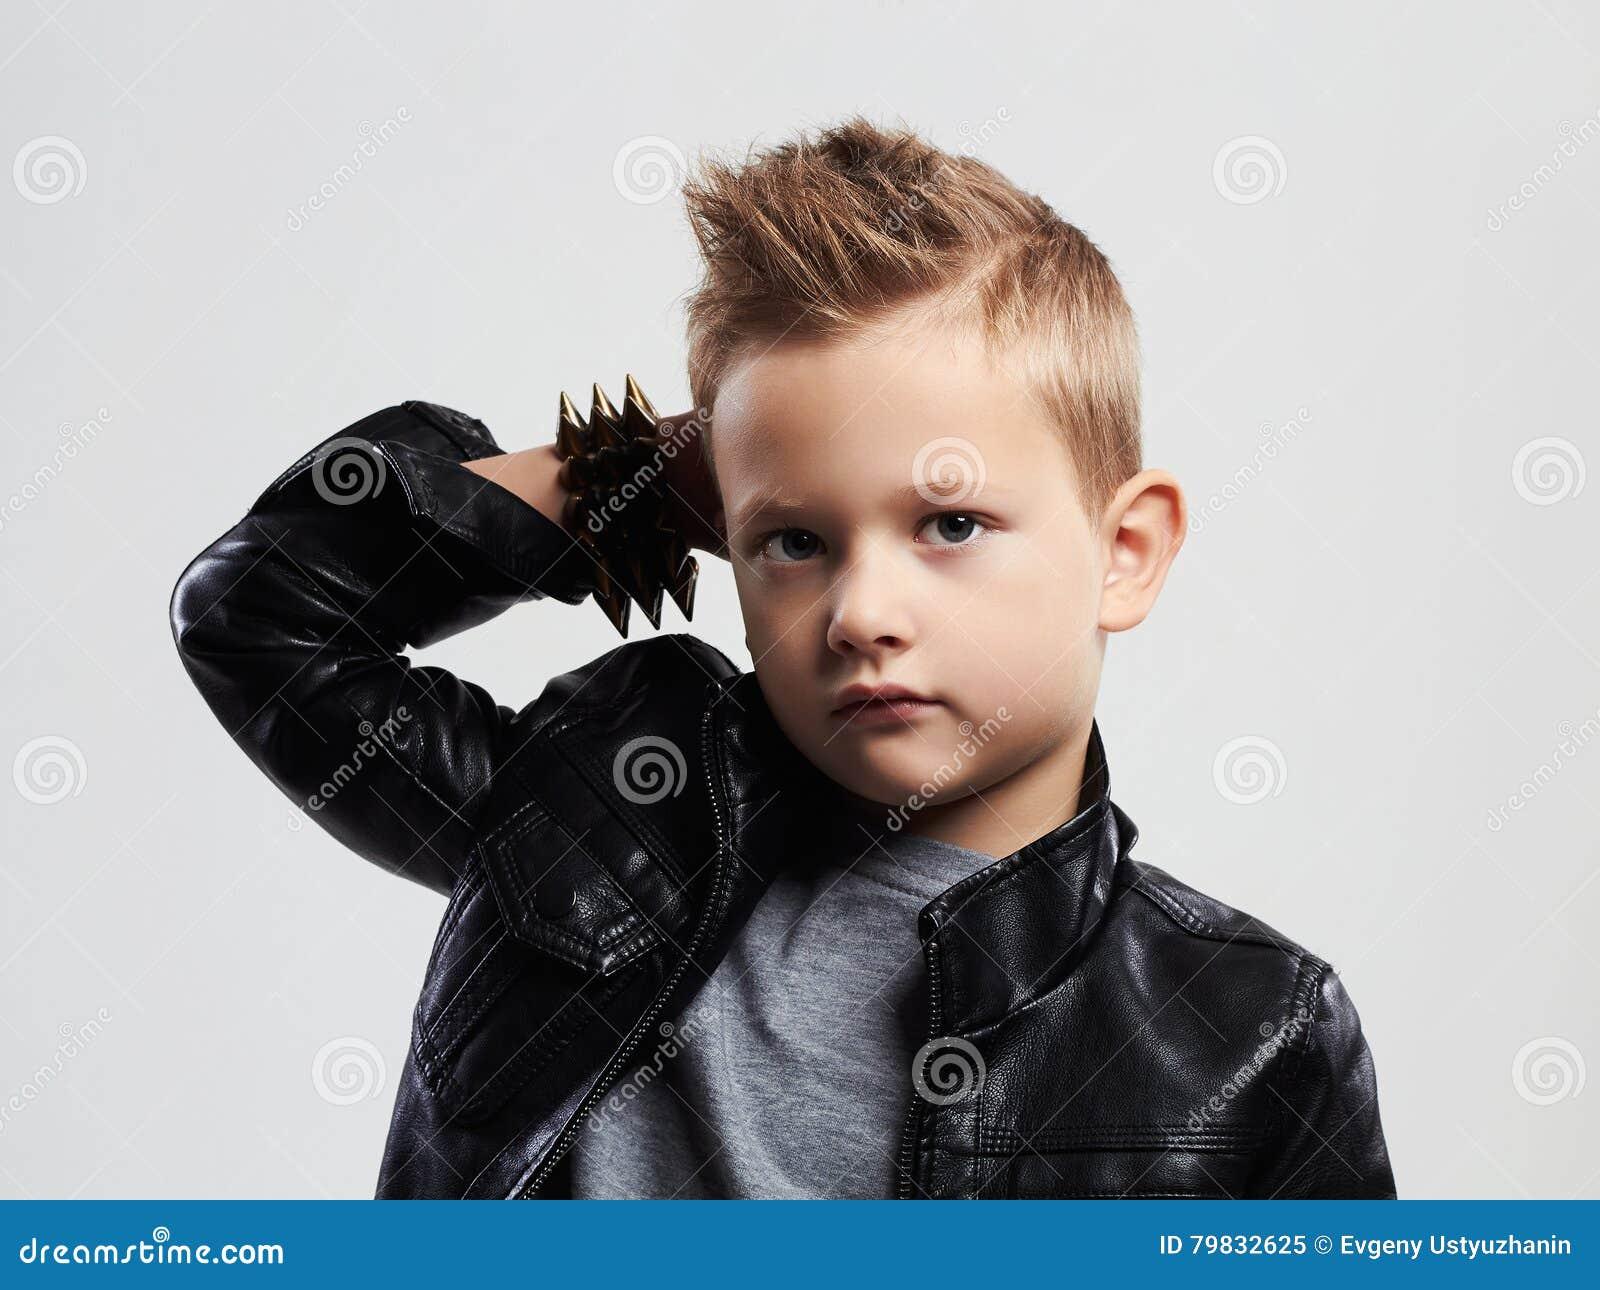 Niño De Moda En La Capa De Cuero Niño Elegante Con Corte ...